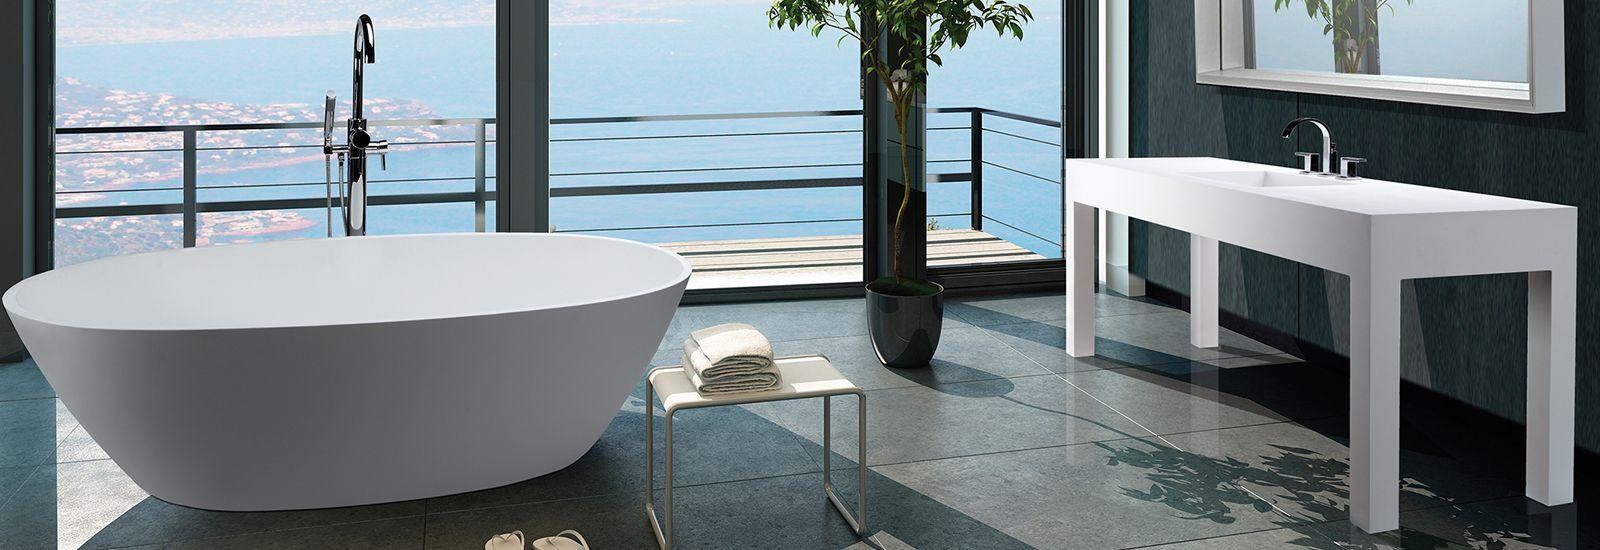 RM Living Cincinnati Modern Interior Design Bathrooms By MTI MTI2